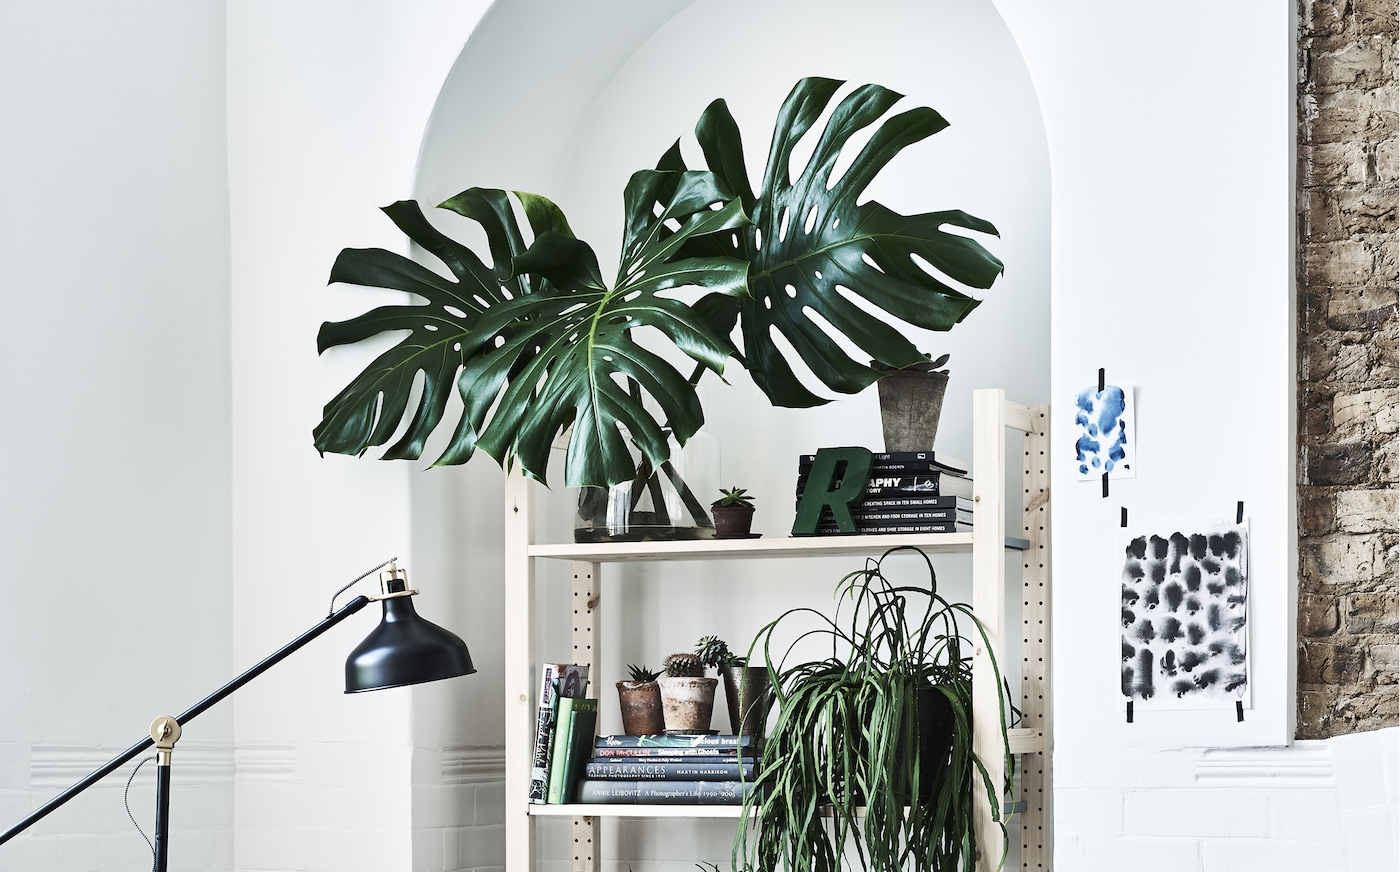 indoor garten ideen sommer das ganze jahr ikea. Black Bedroom Furniture Sets. Home Design Ideas